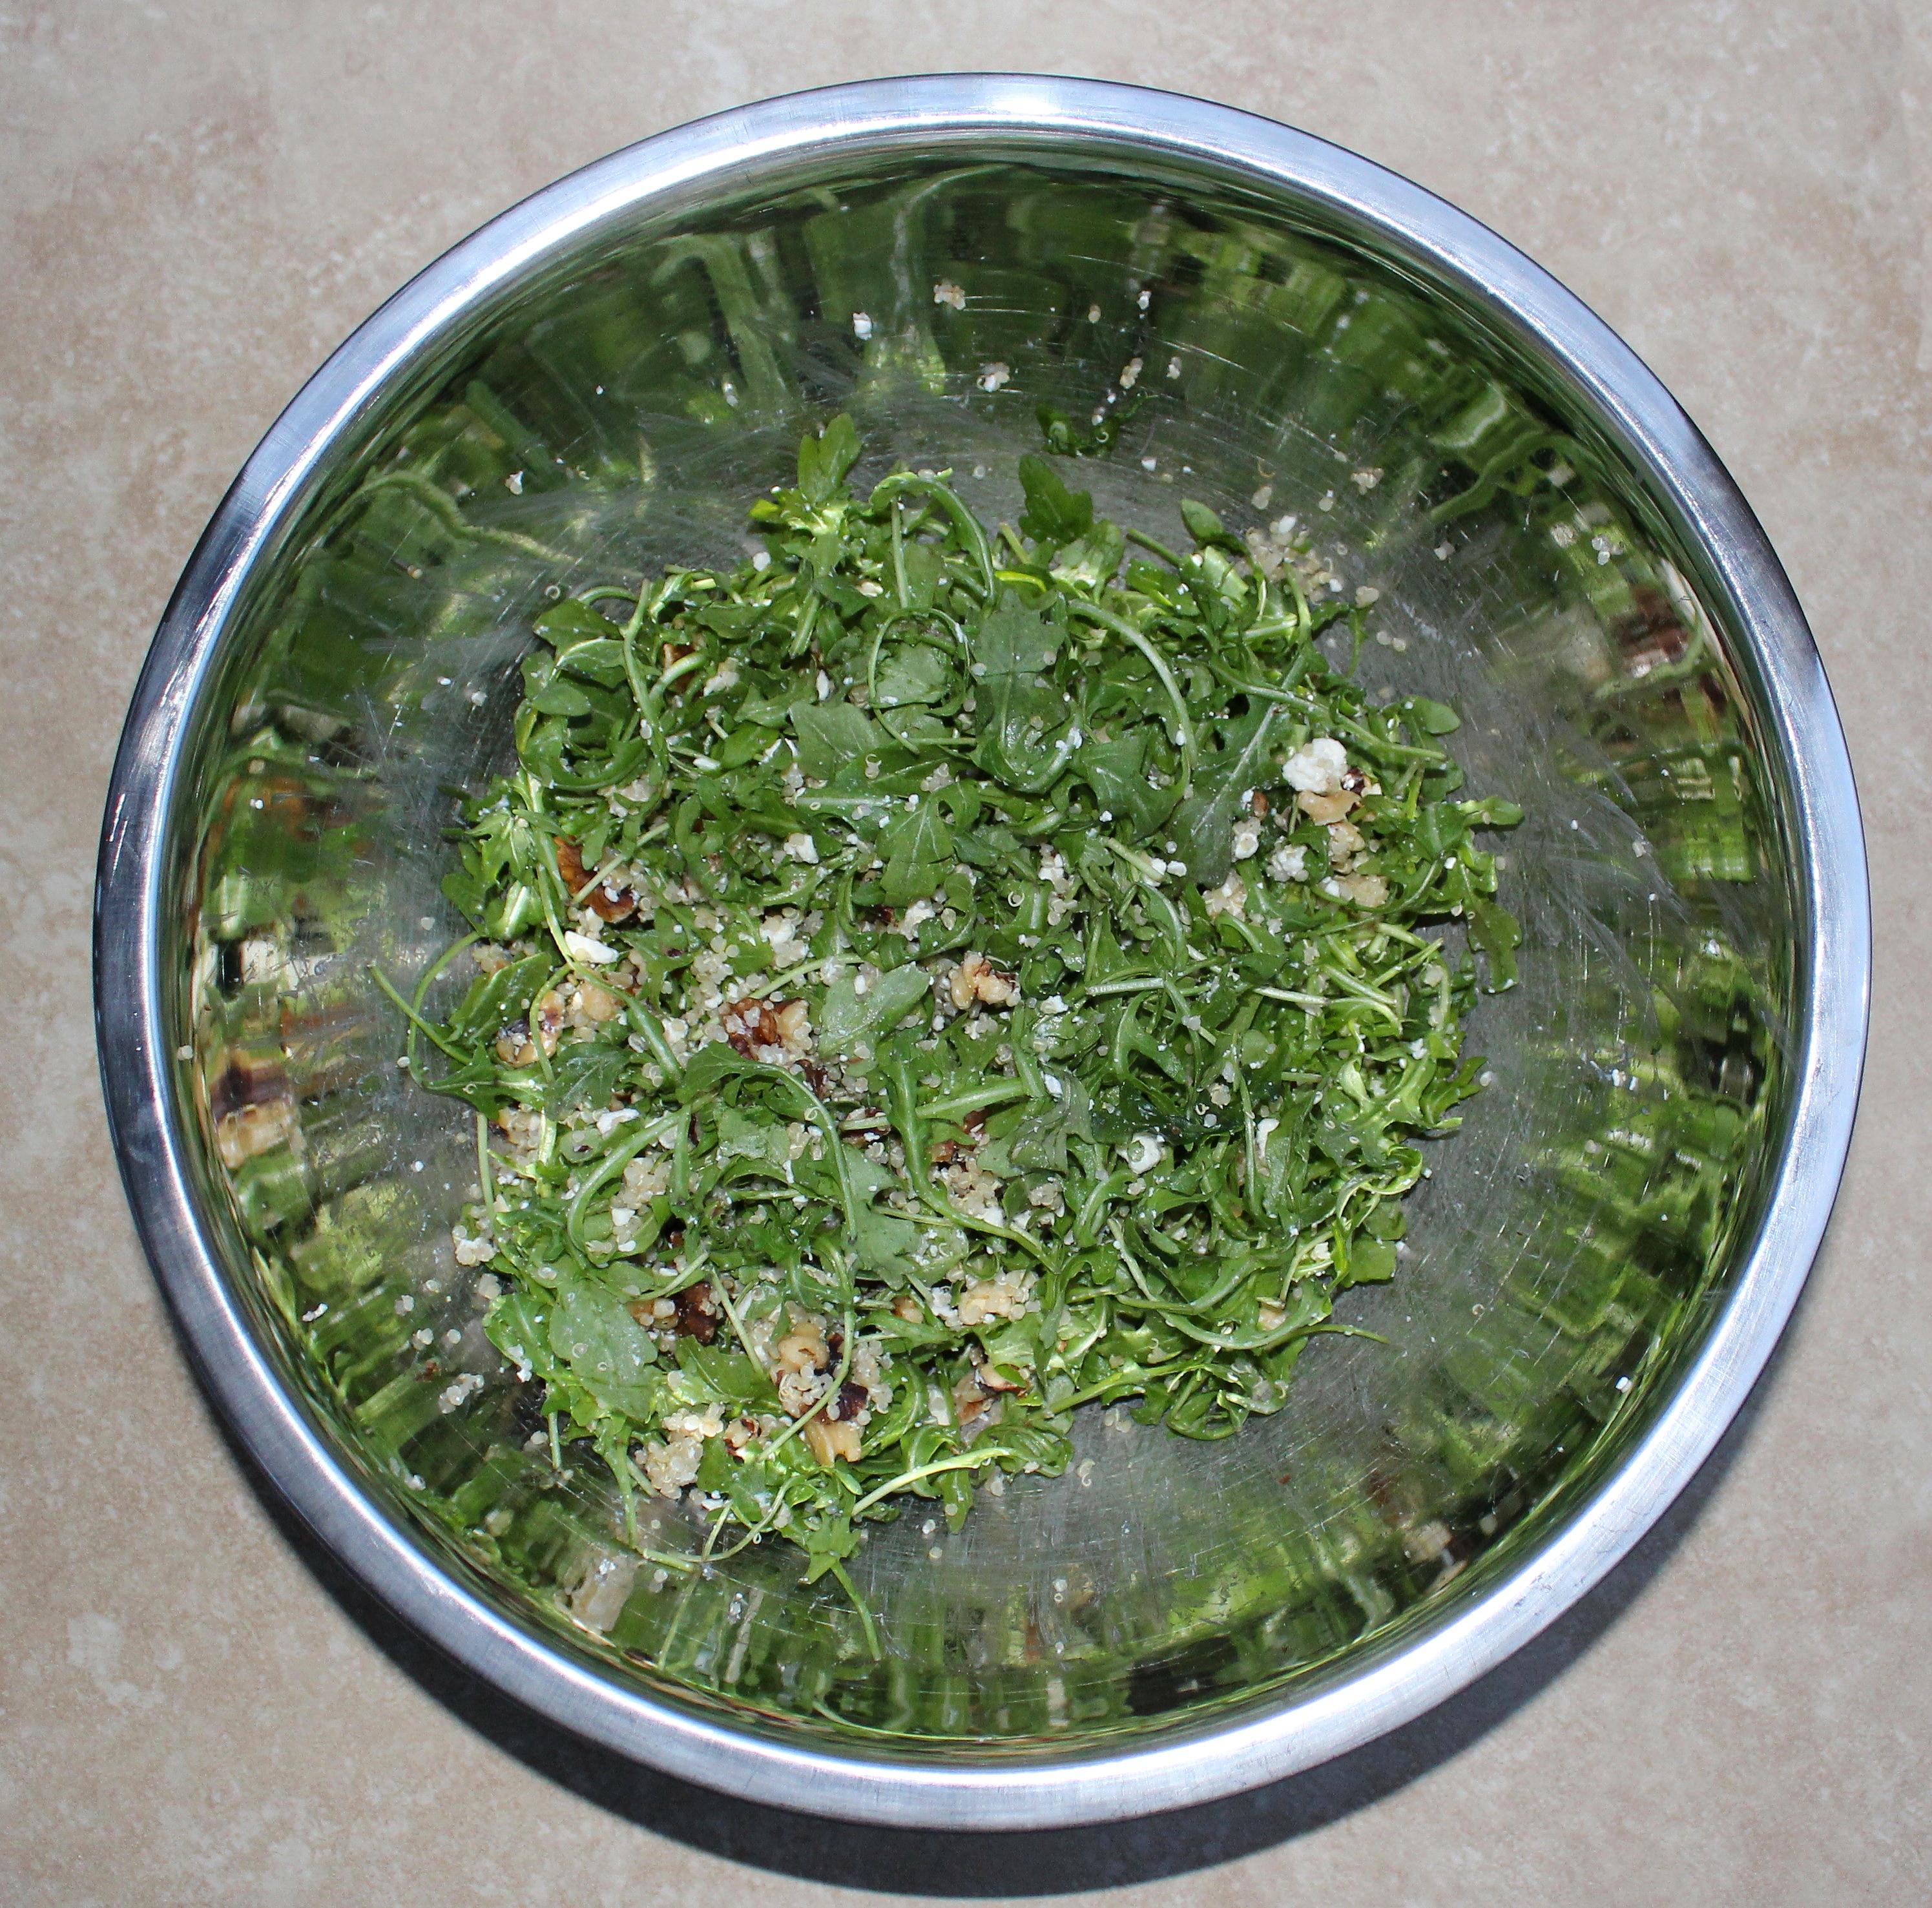 Arugula Quinoa Salad with Baked Pears and Meyer Lemon Vinaigrette 2